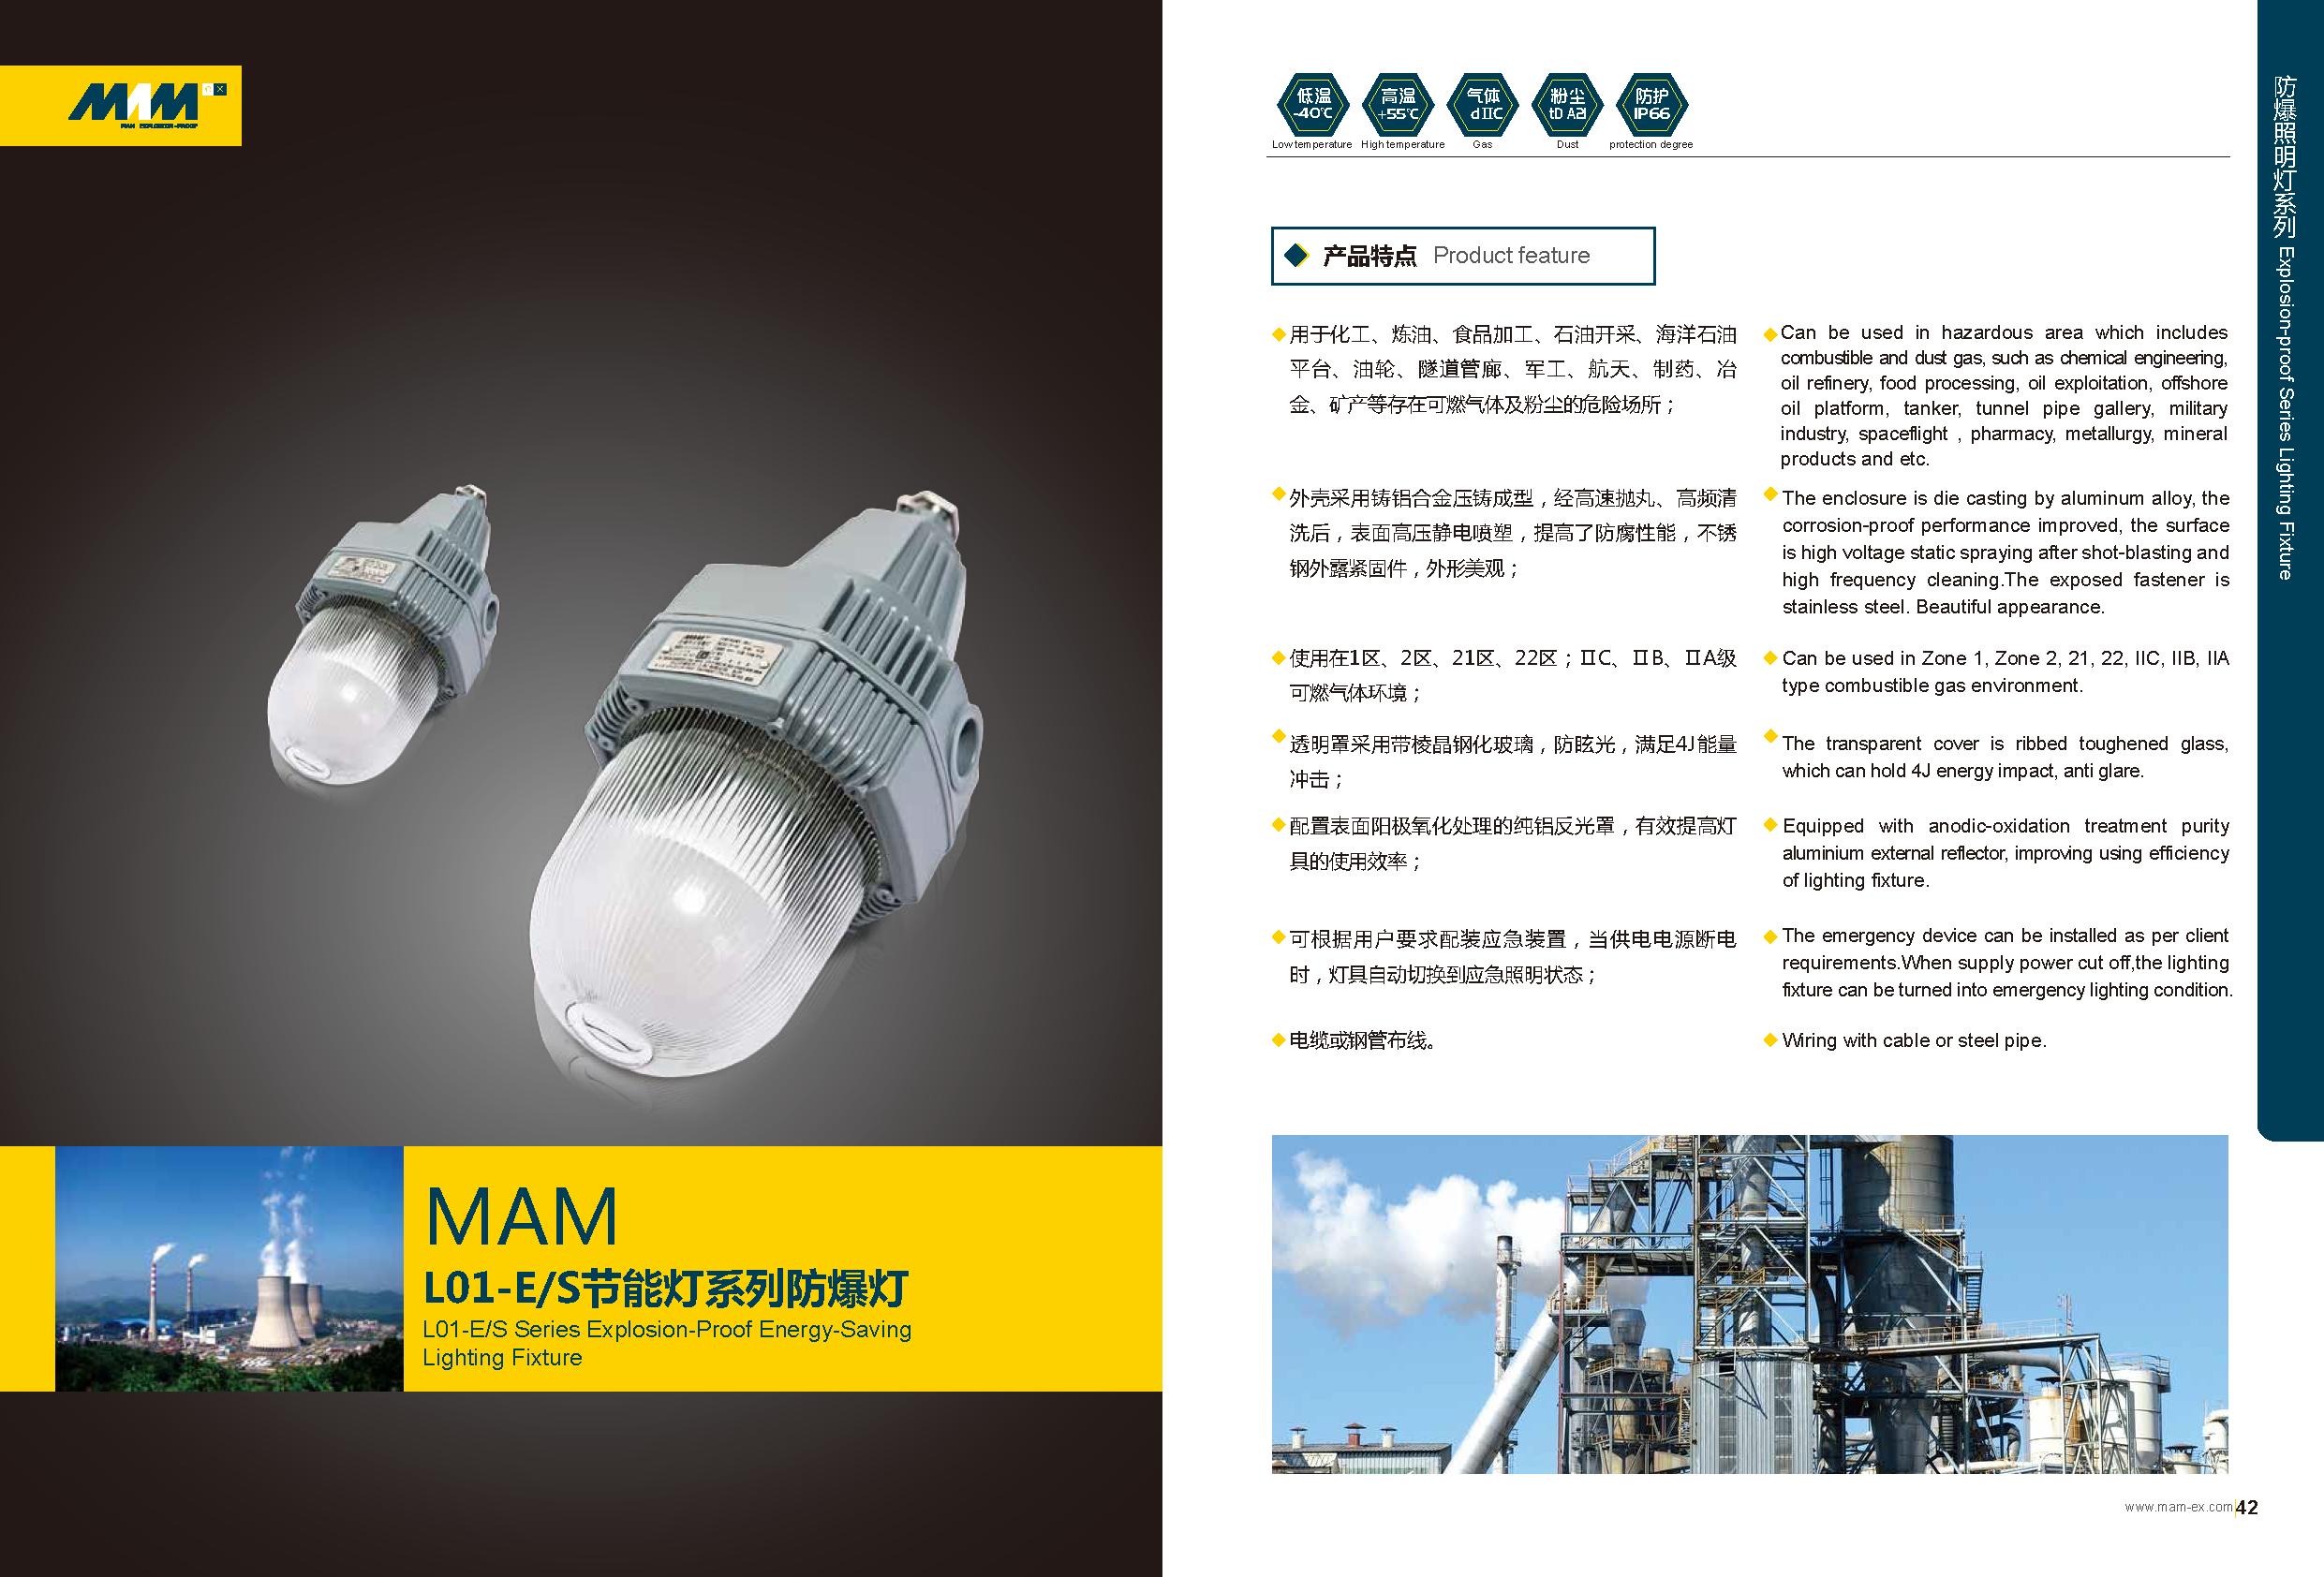 Explosion-proof Lighting Fixture MAML-01-S Series